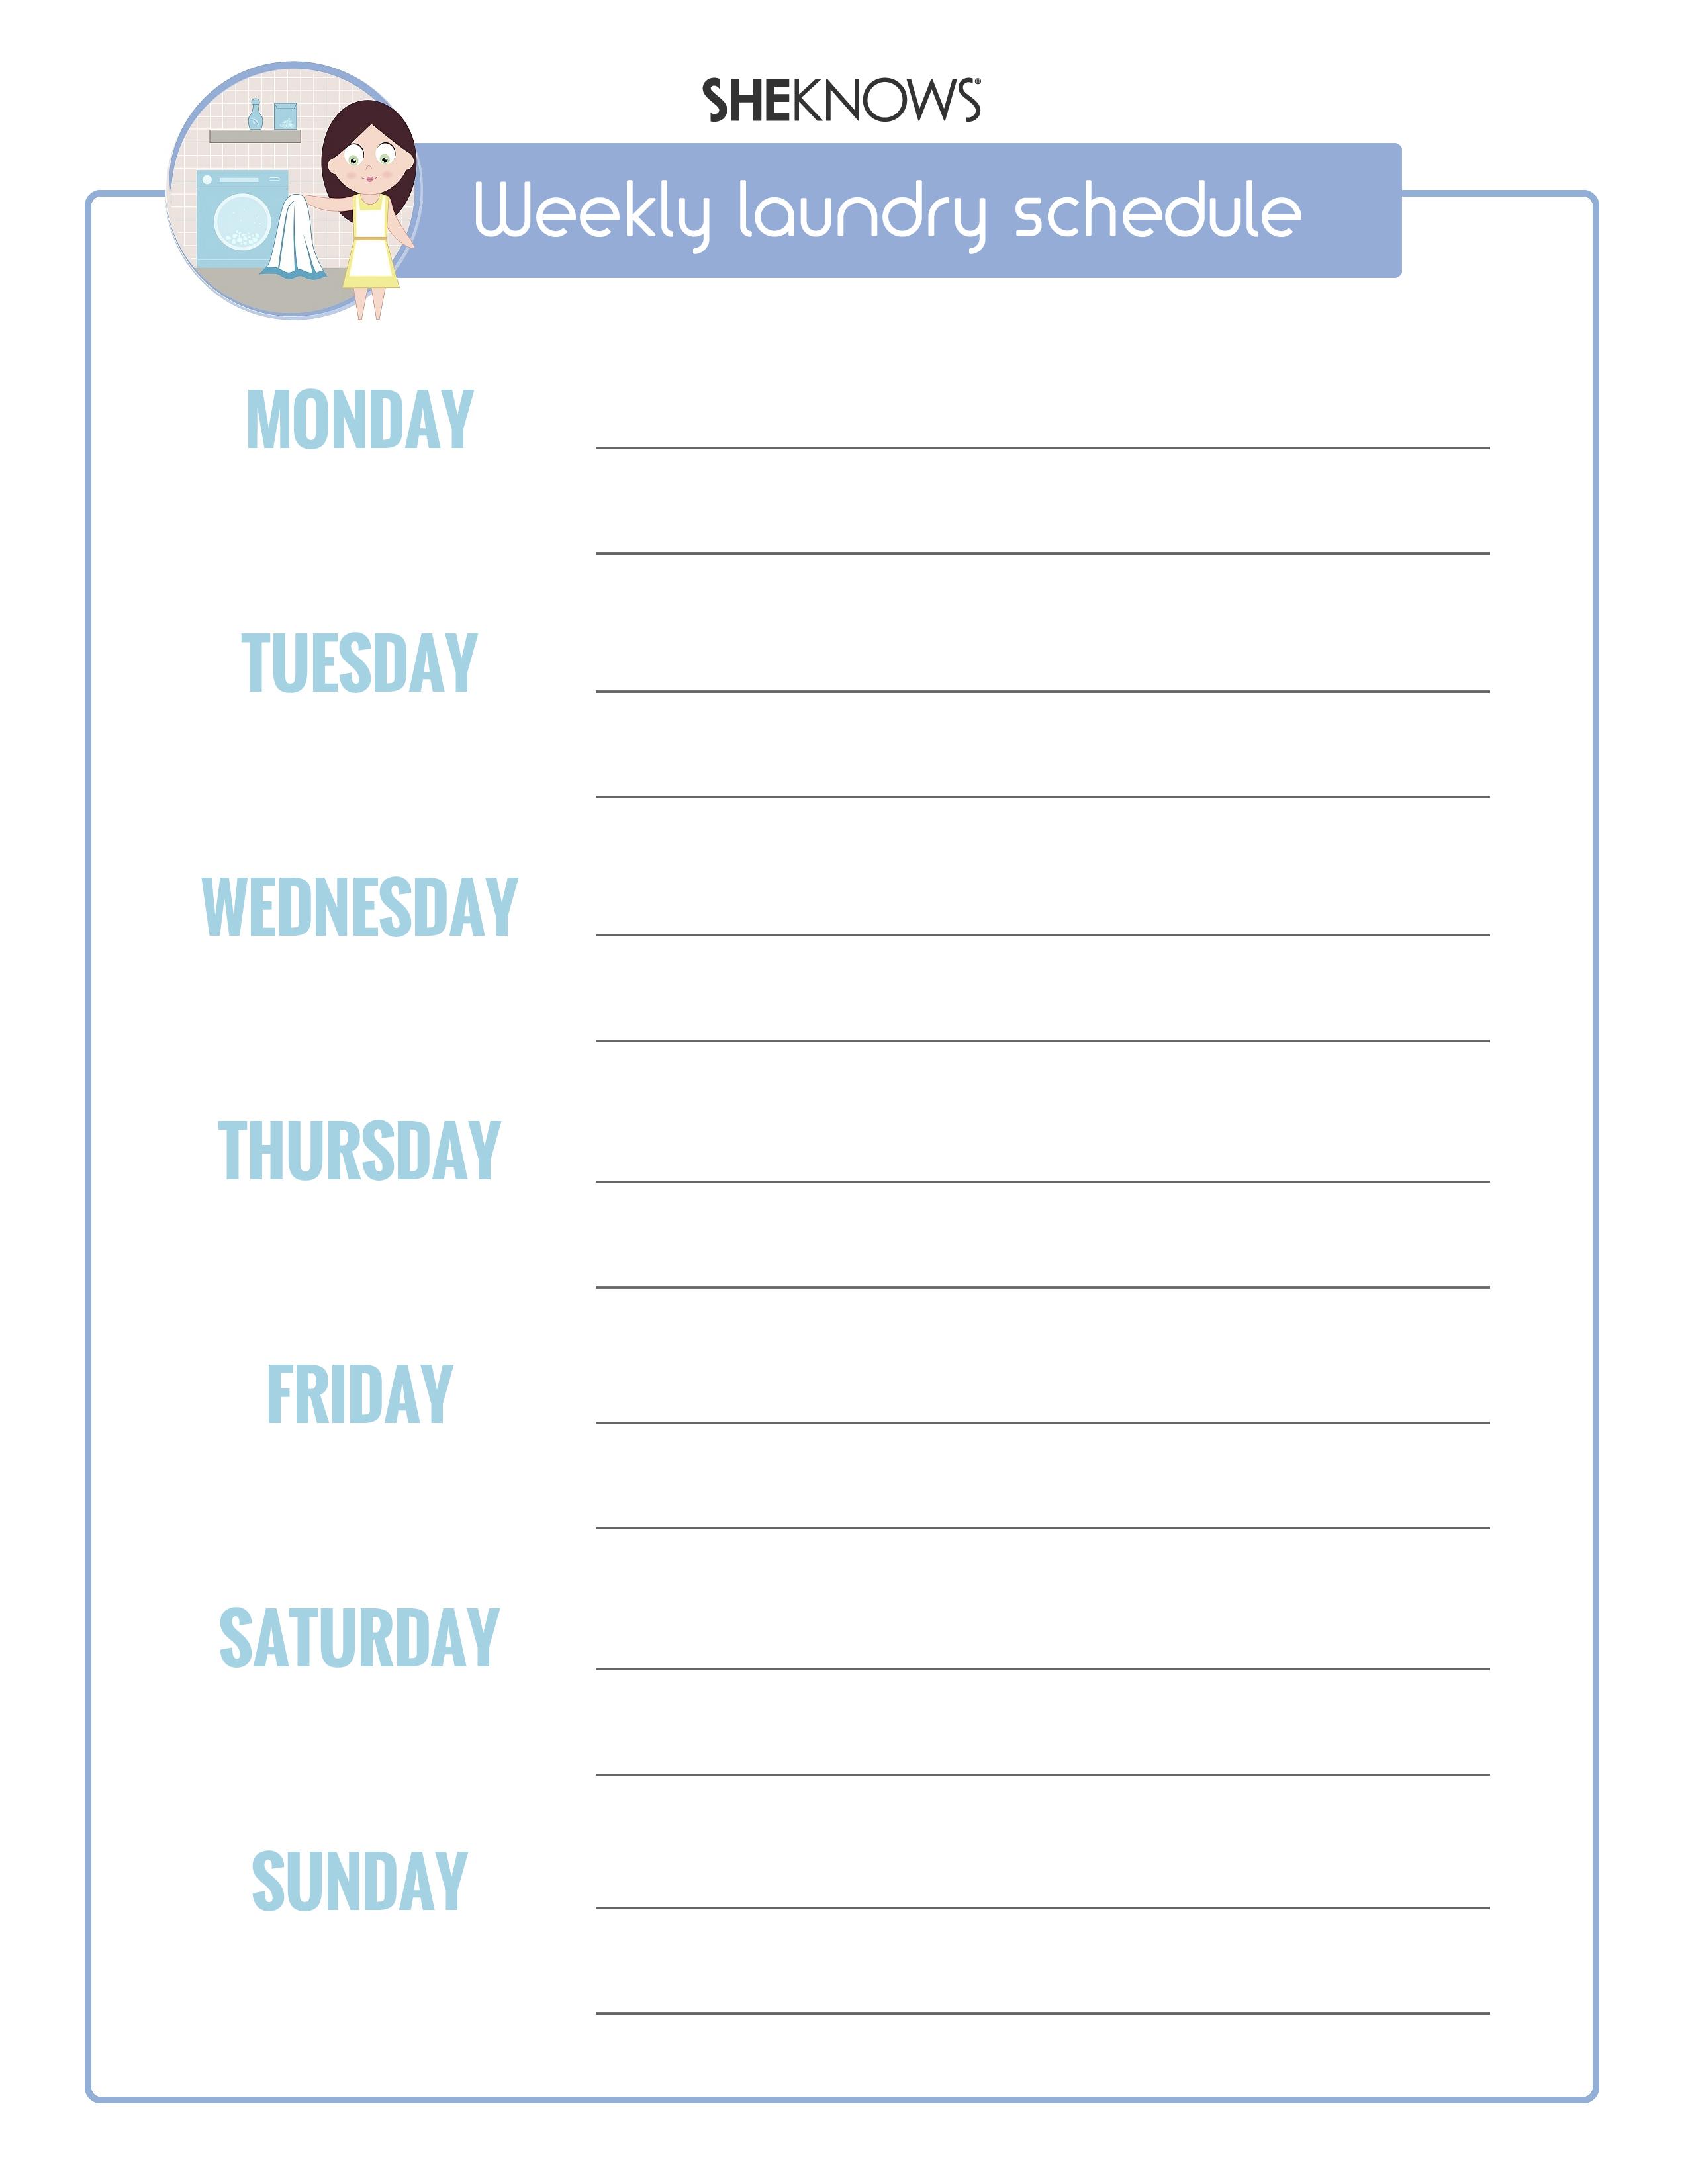 Laundry calendar printable | SheKnows.com version 1